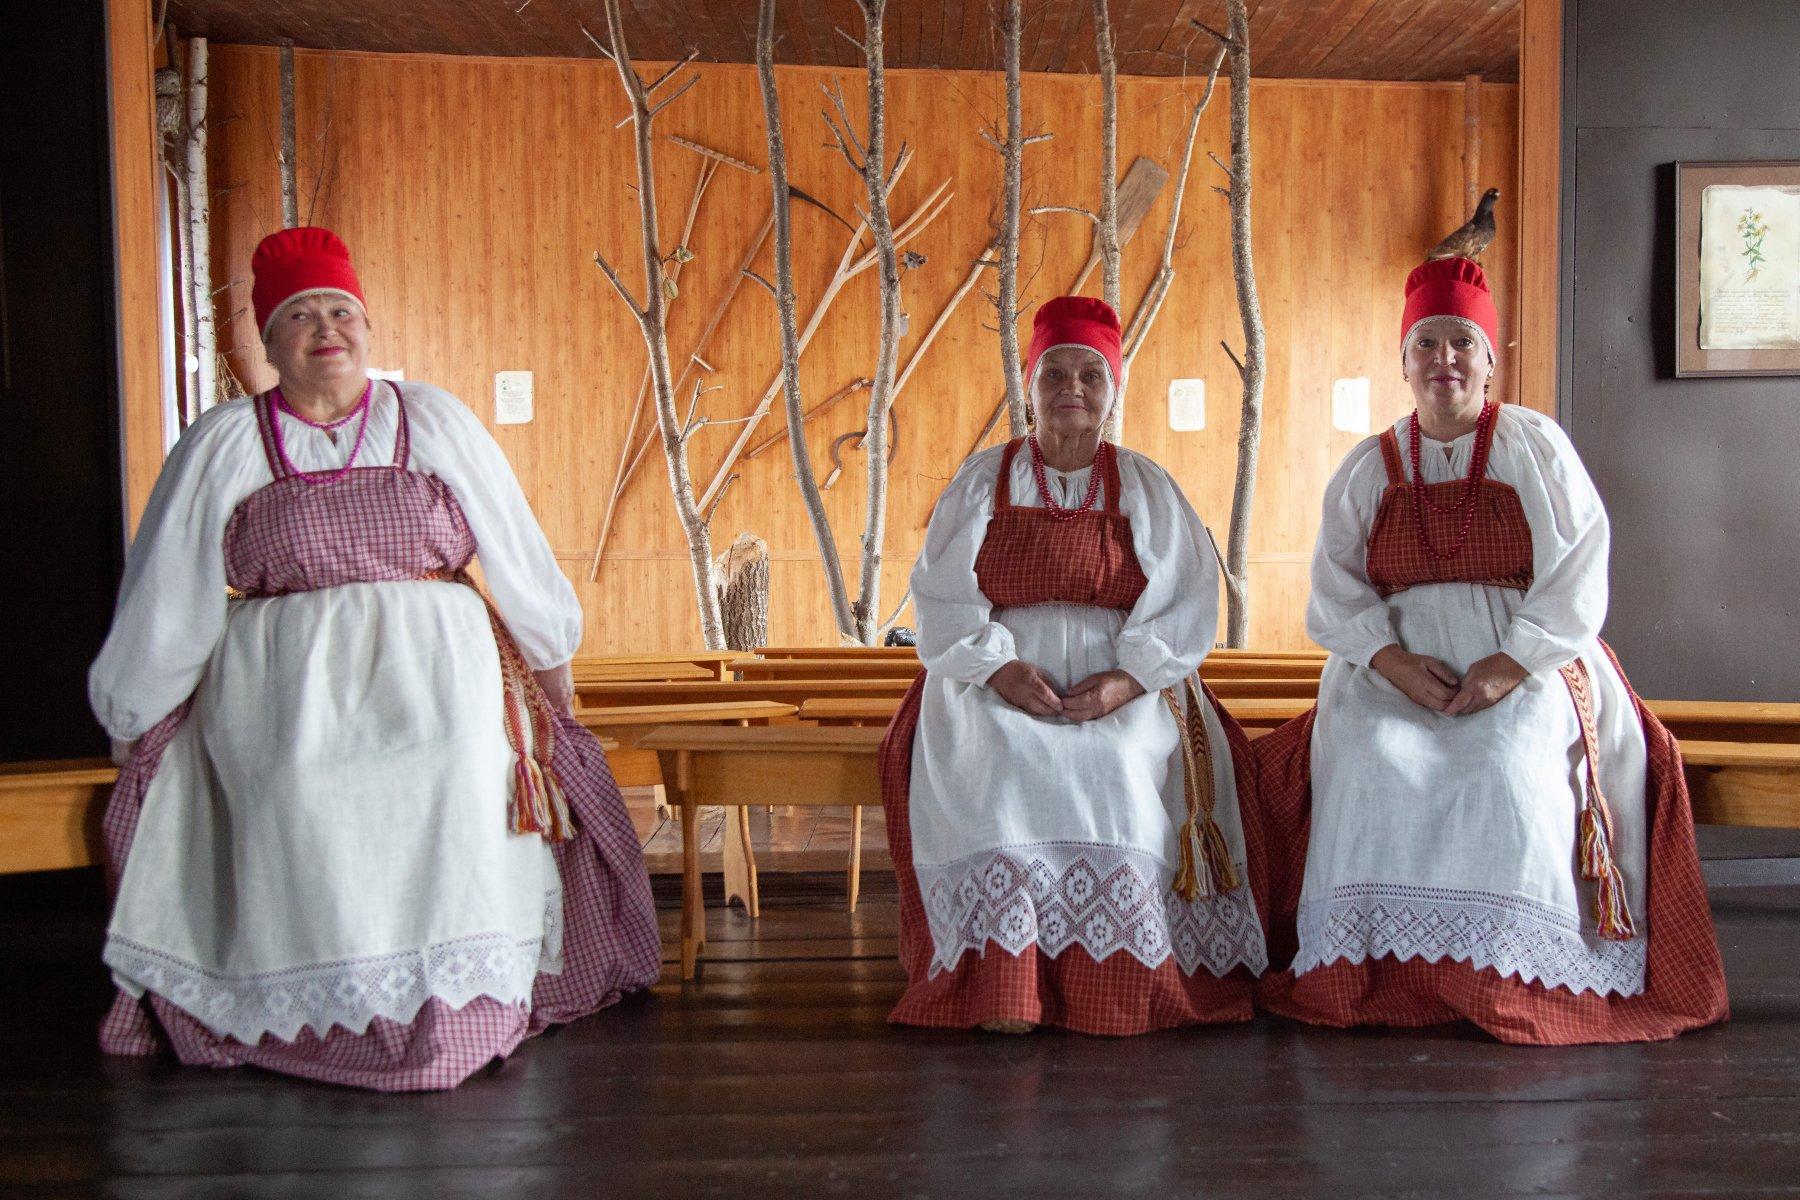 Музей Легенды Нургуша. Фото М. Р. Арасланова